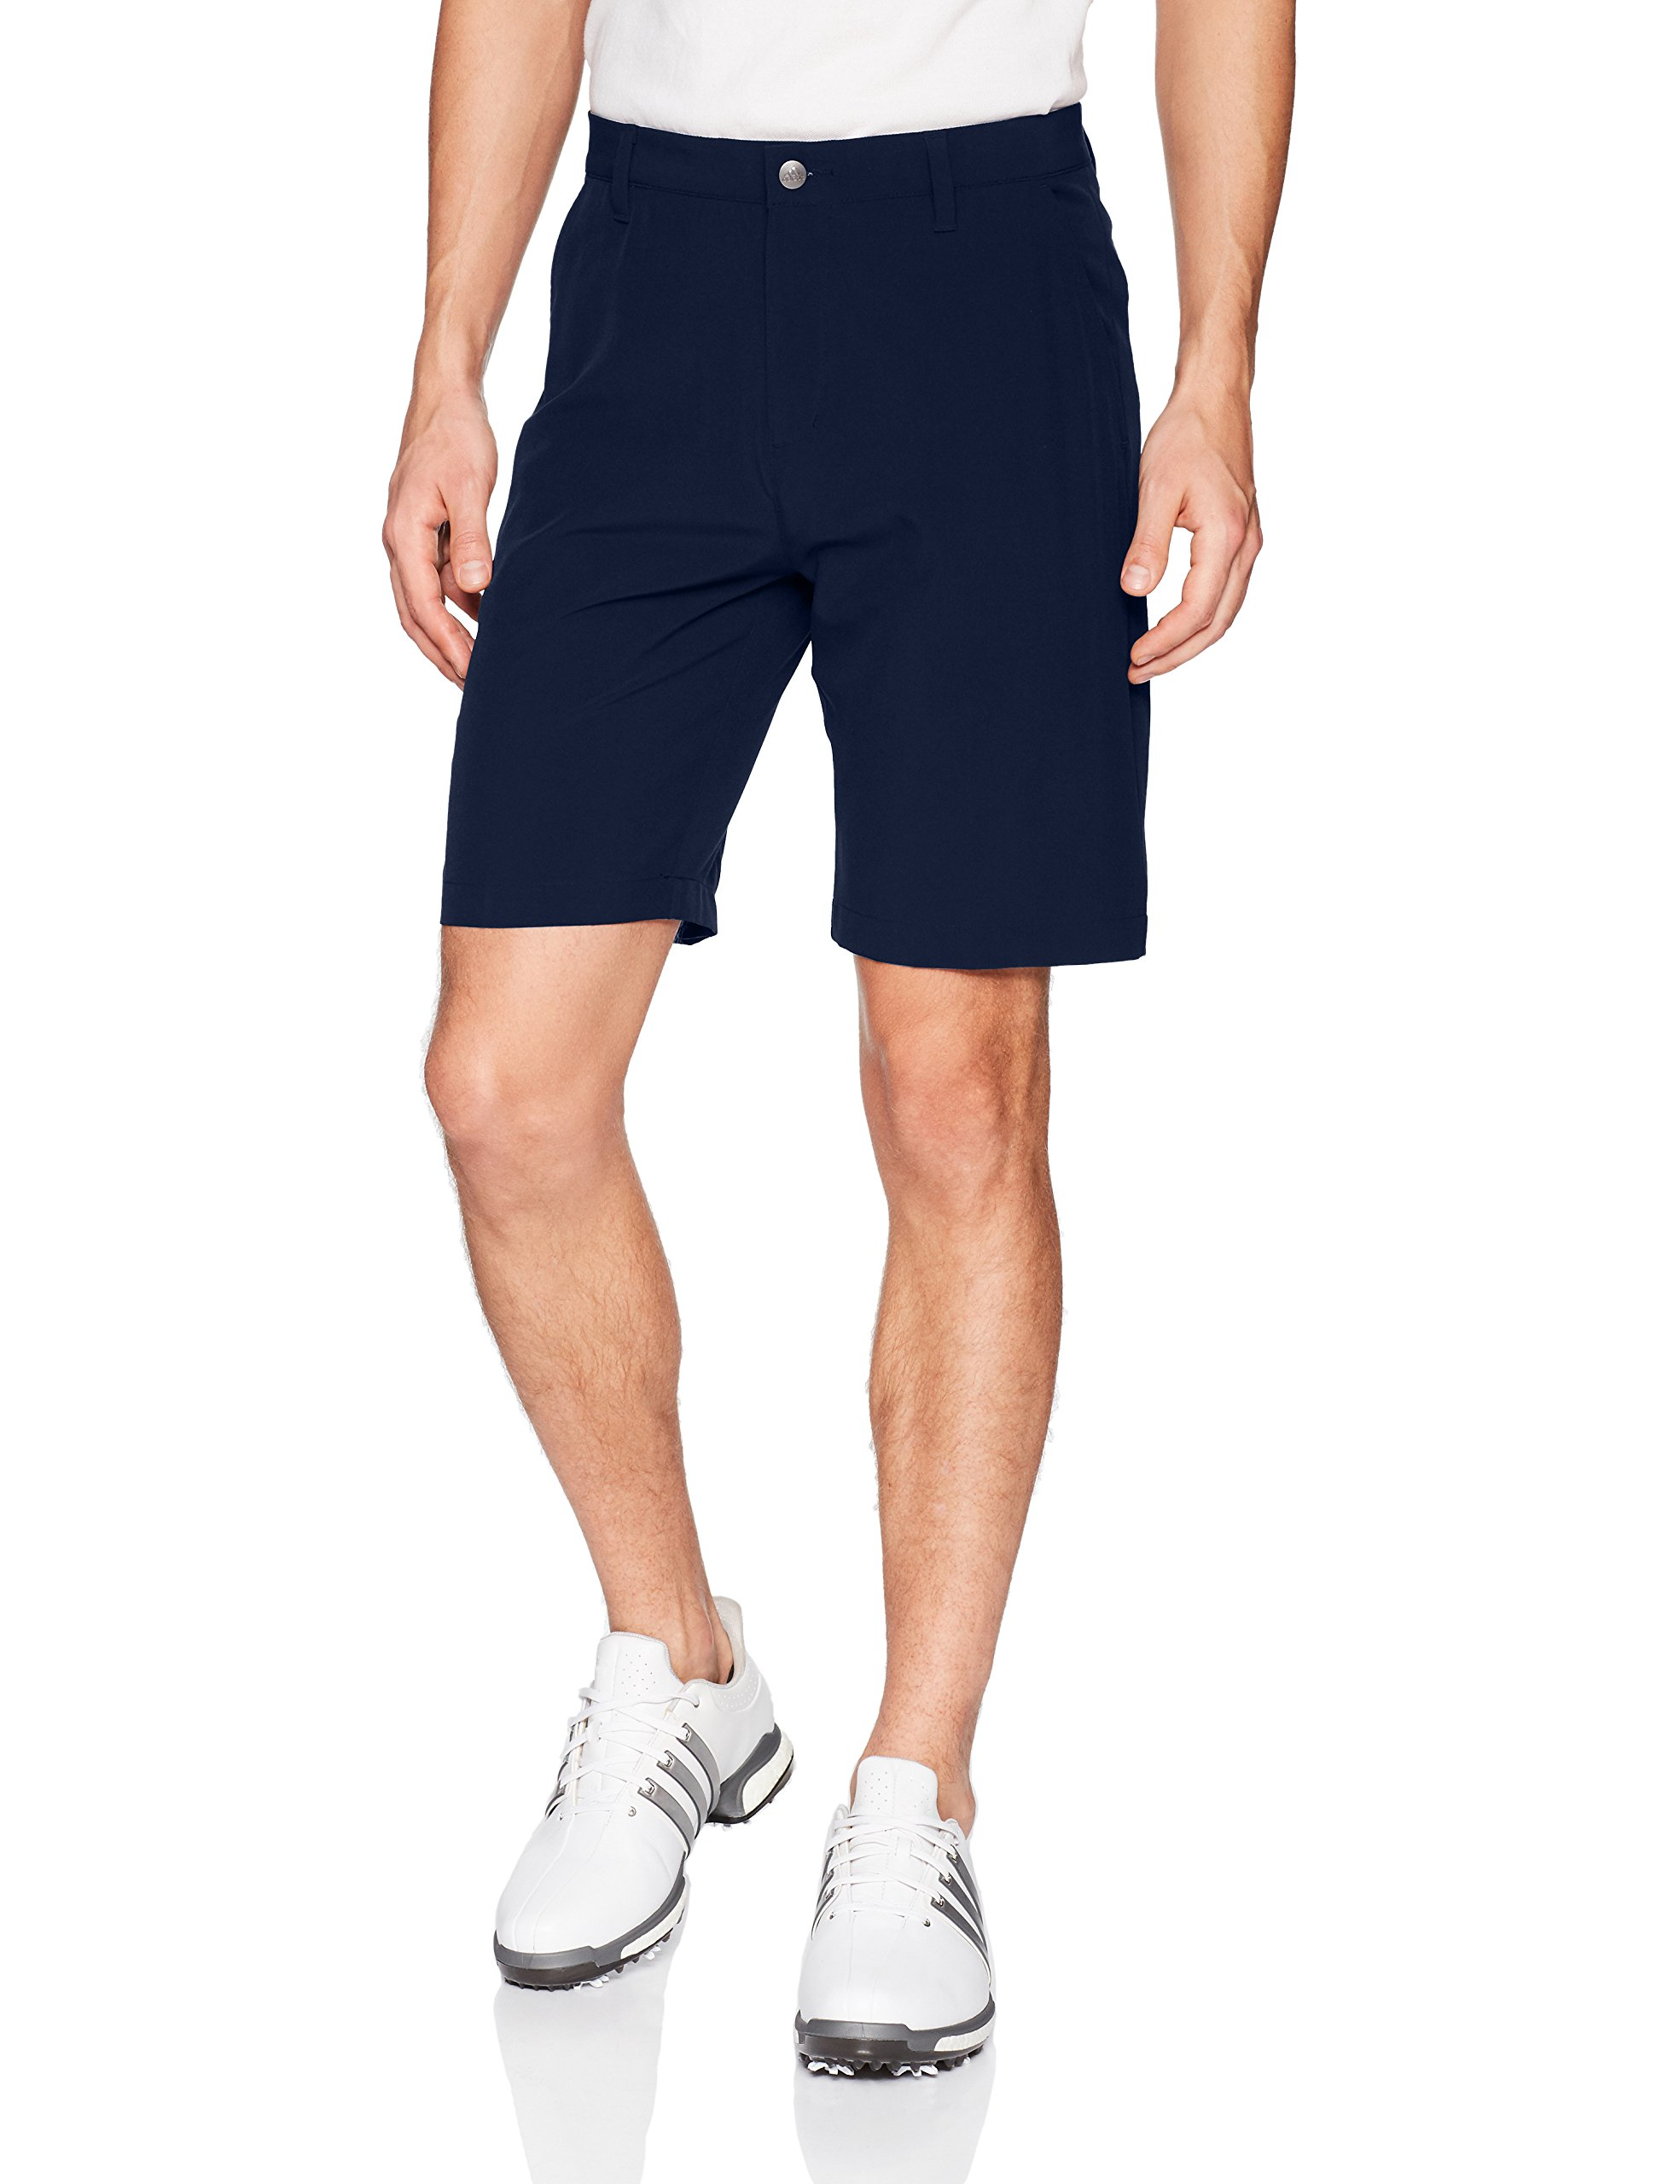 adidas Golf Ultimate 365 Short 9'', Collegiate Navy, 35'' by adidas